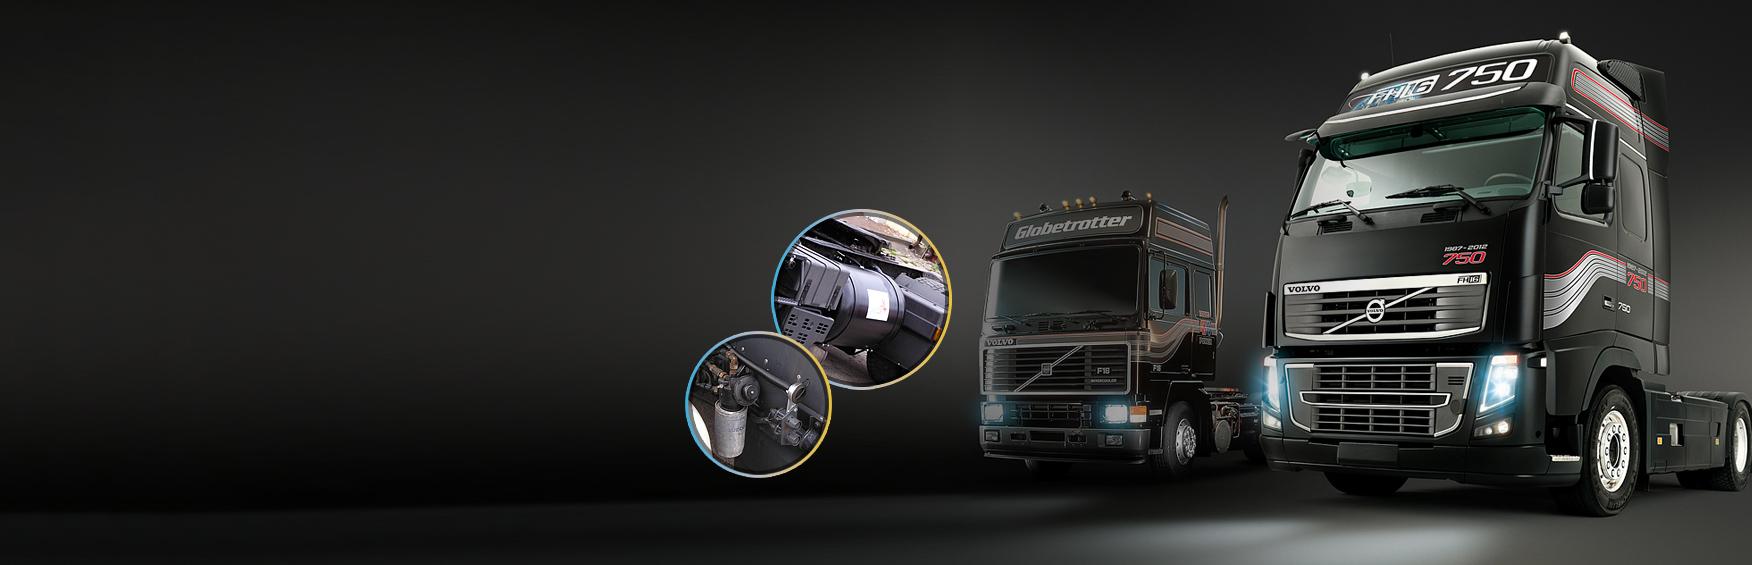 Cogas Truck